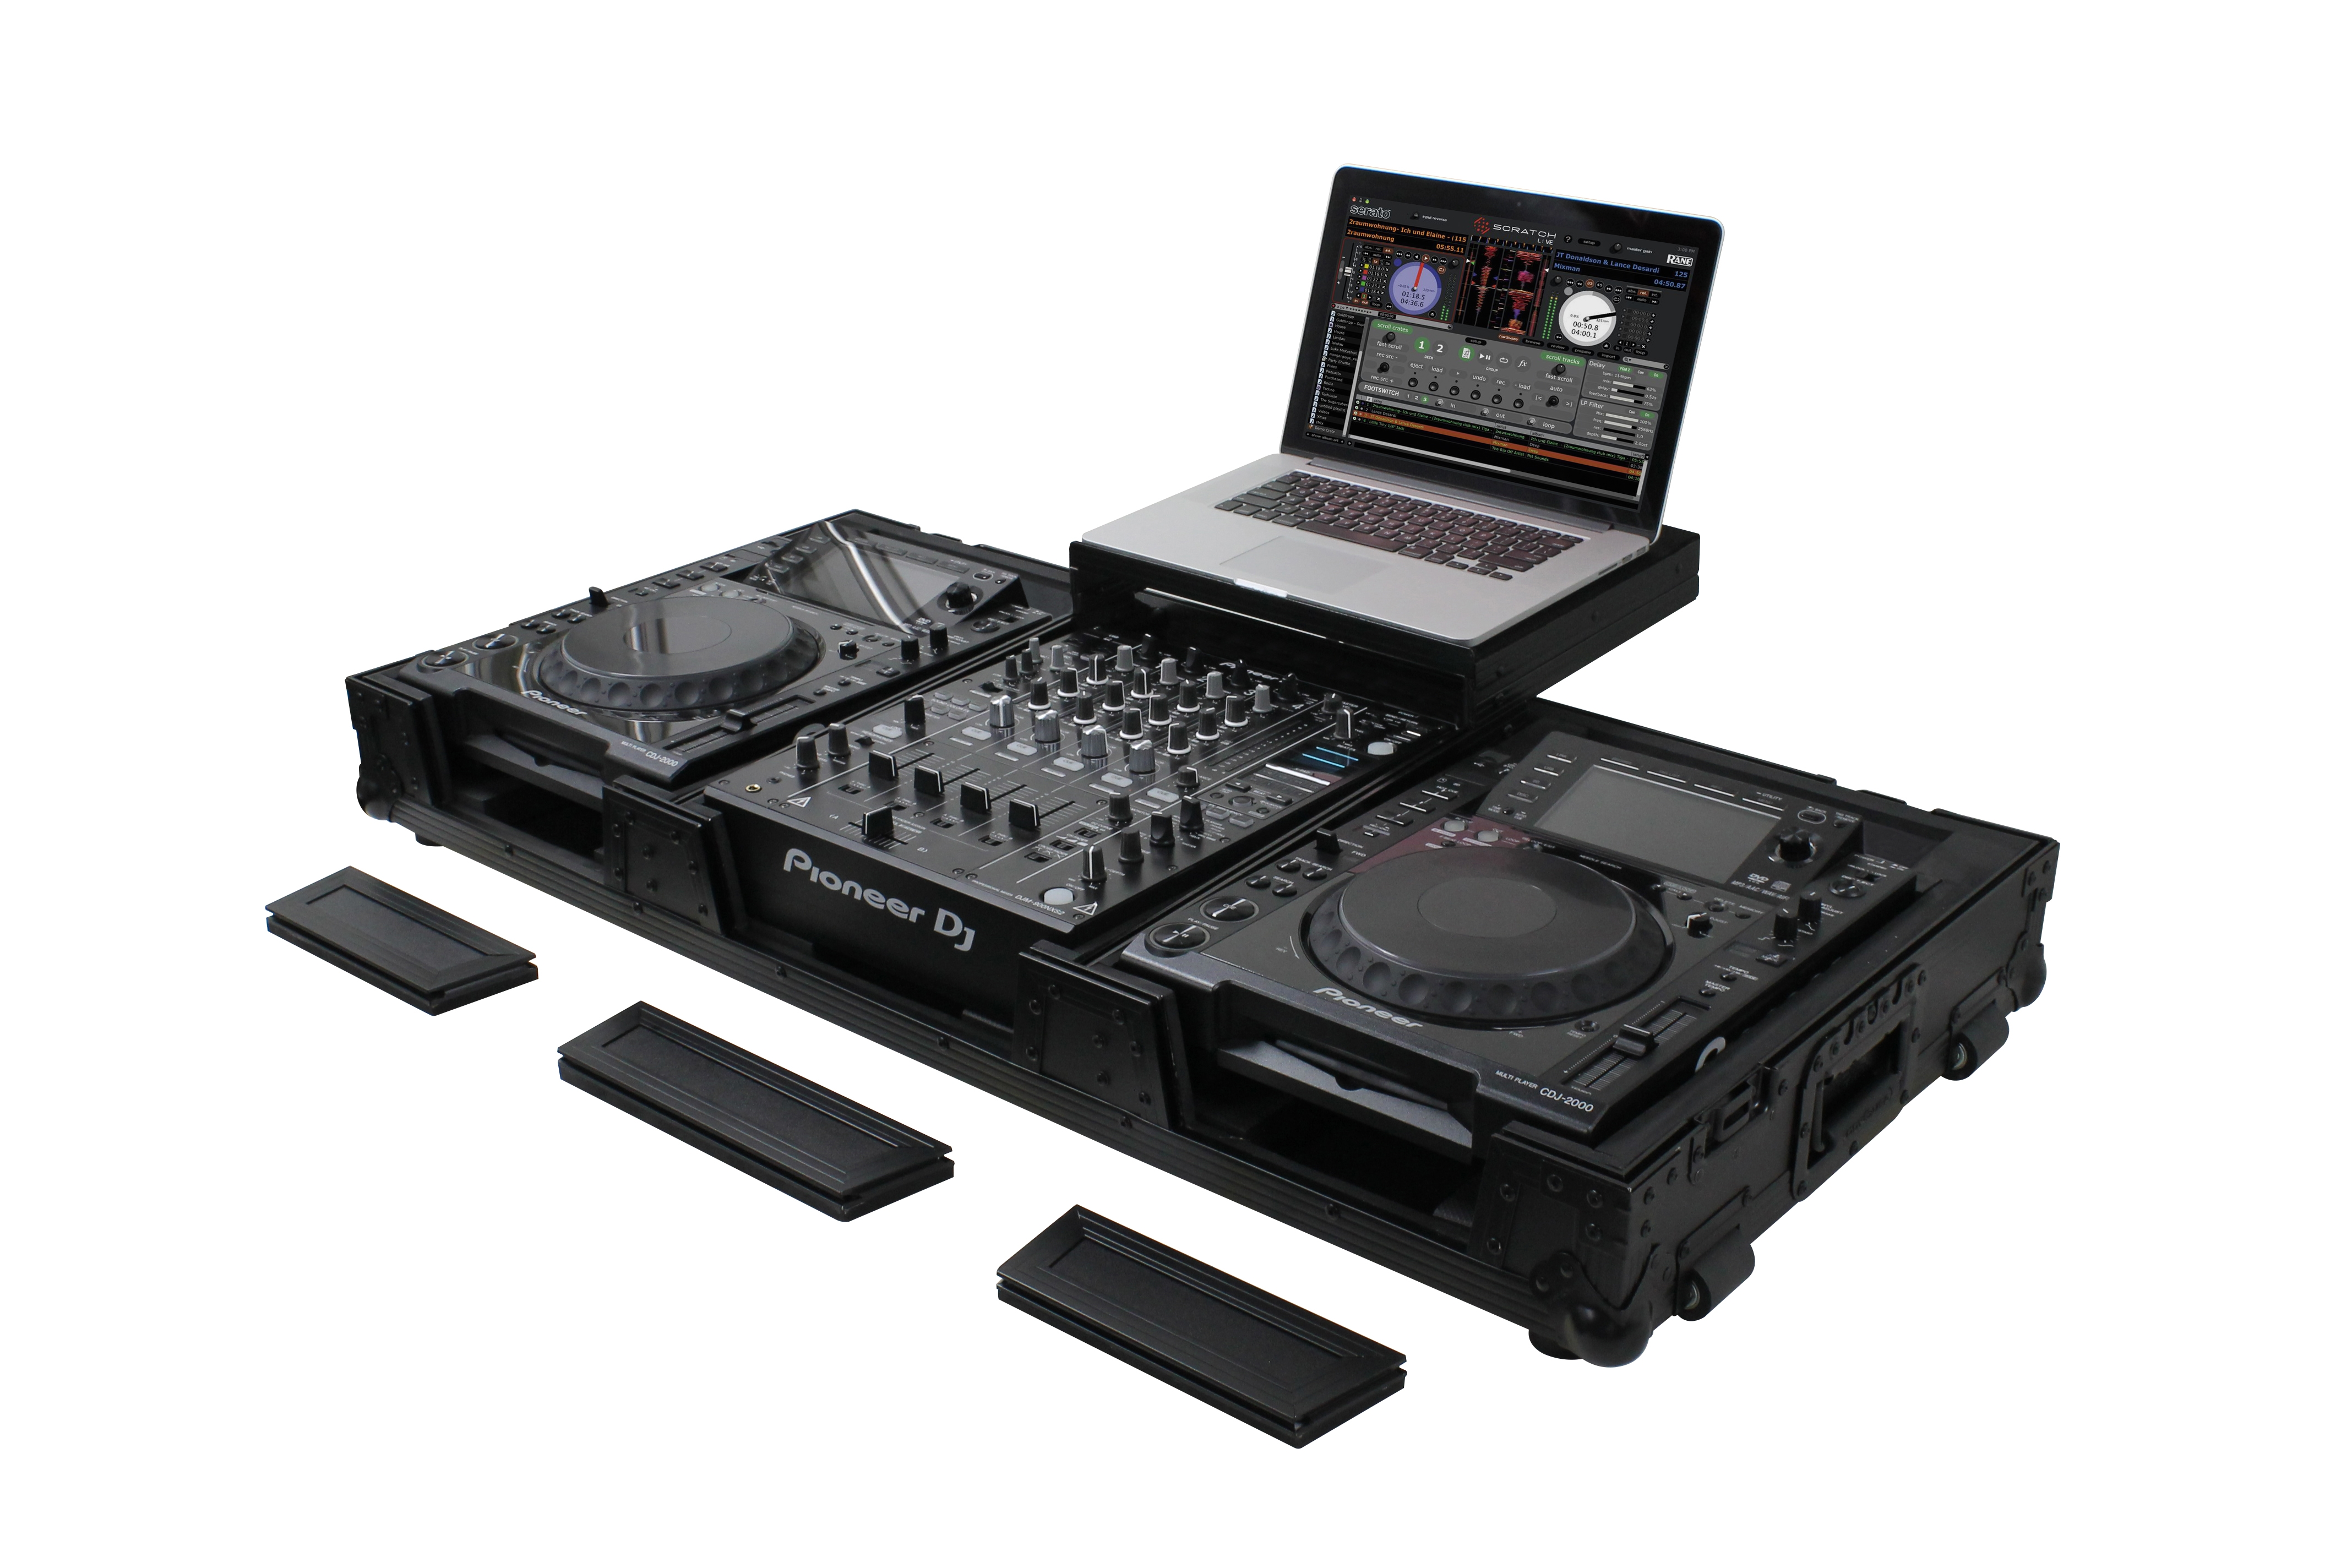 dj mixer profile pic